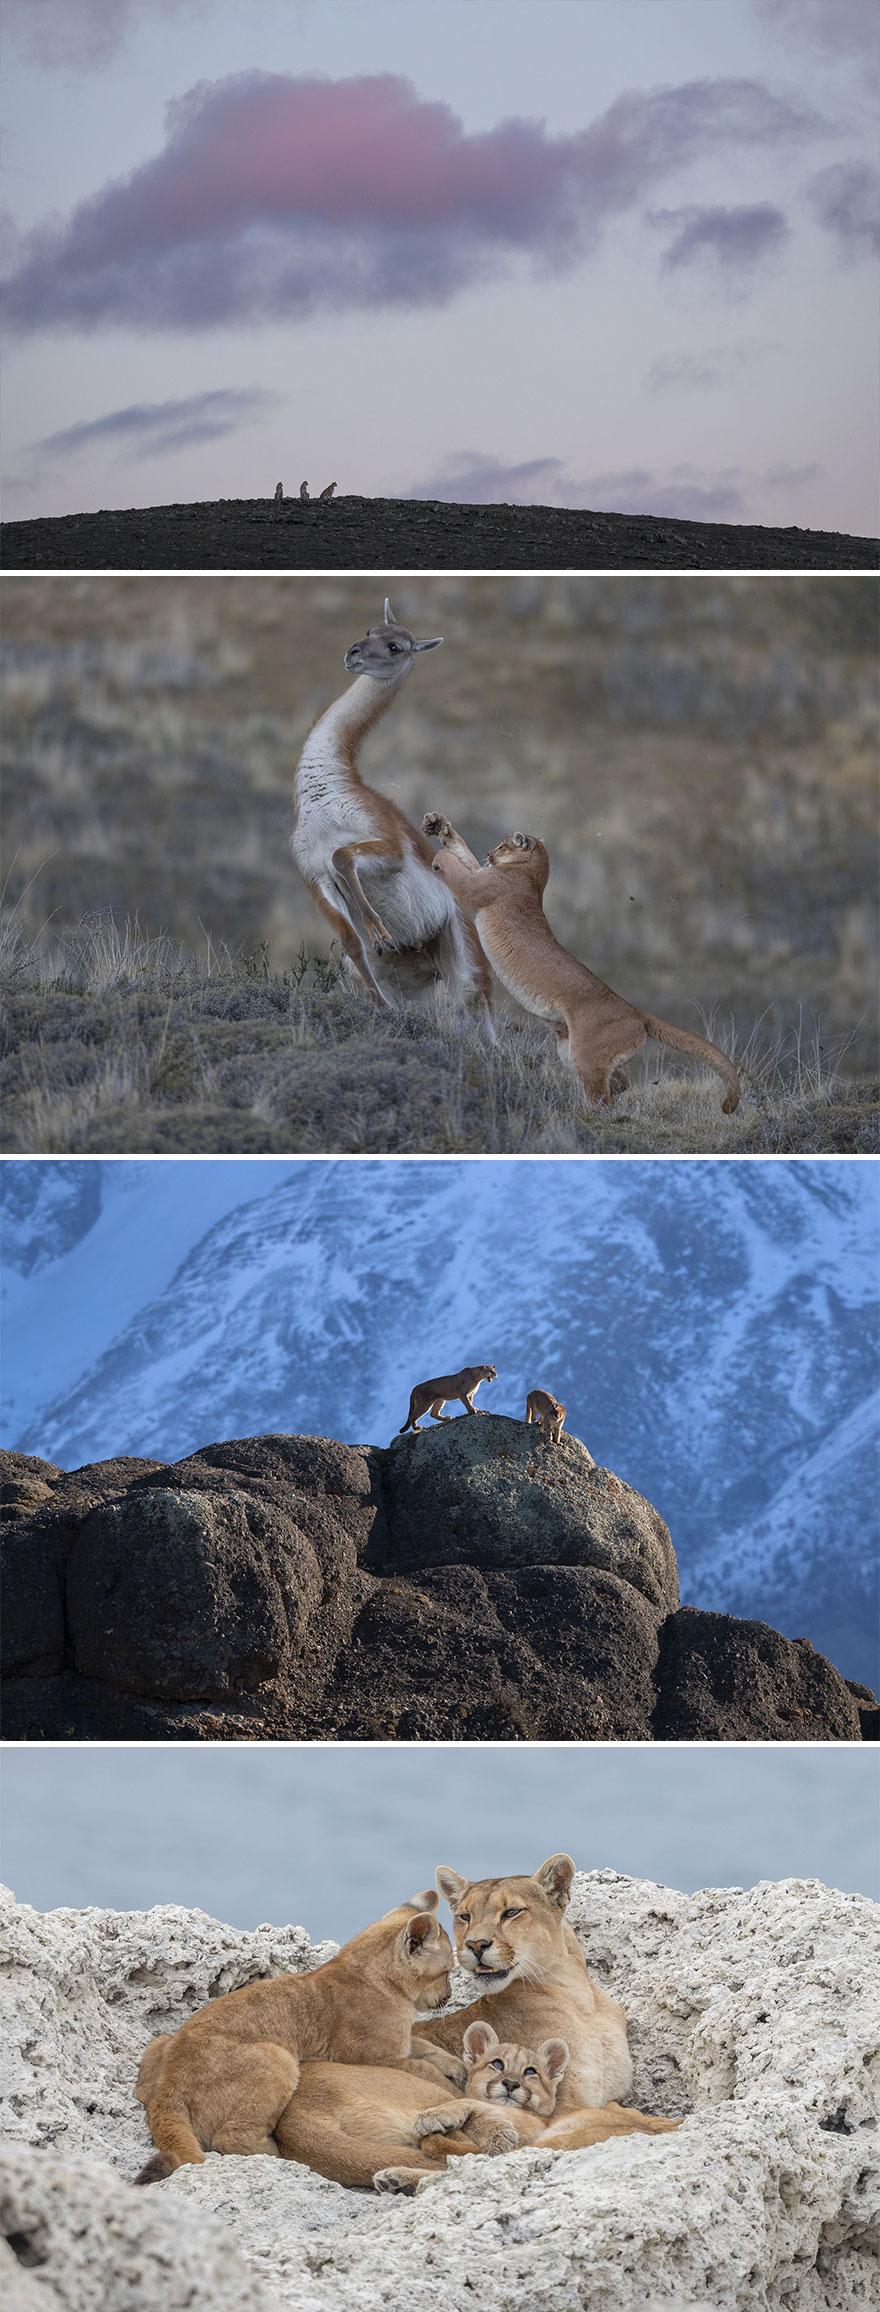 "Nature, Stories, 3rd Prize, ""Wild Pumas Of Patagonia"" By Ingo Arndt"